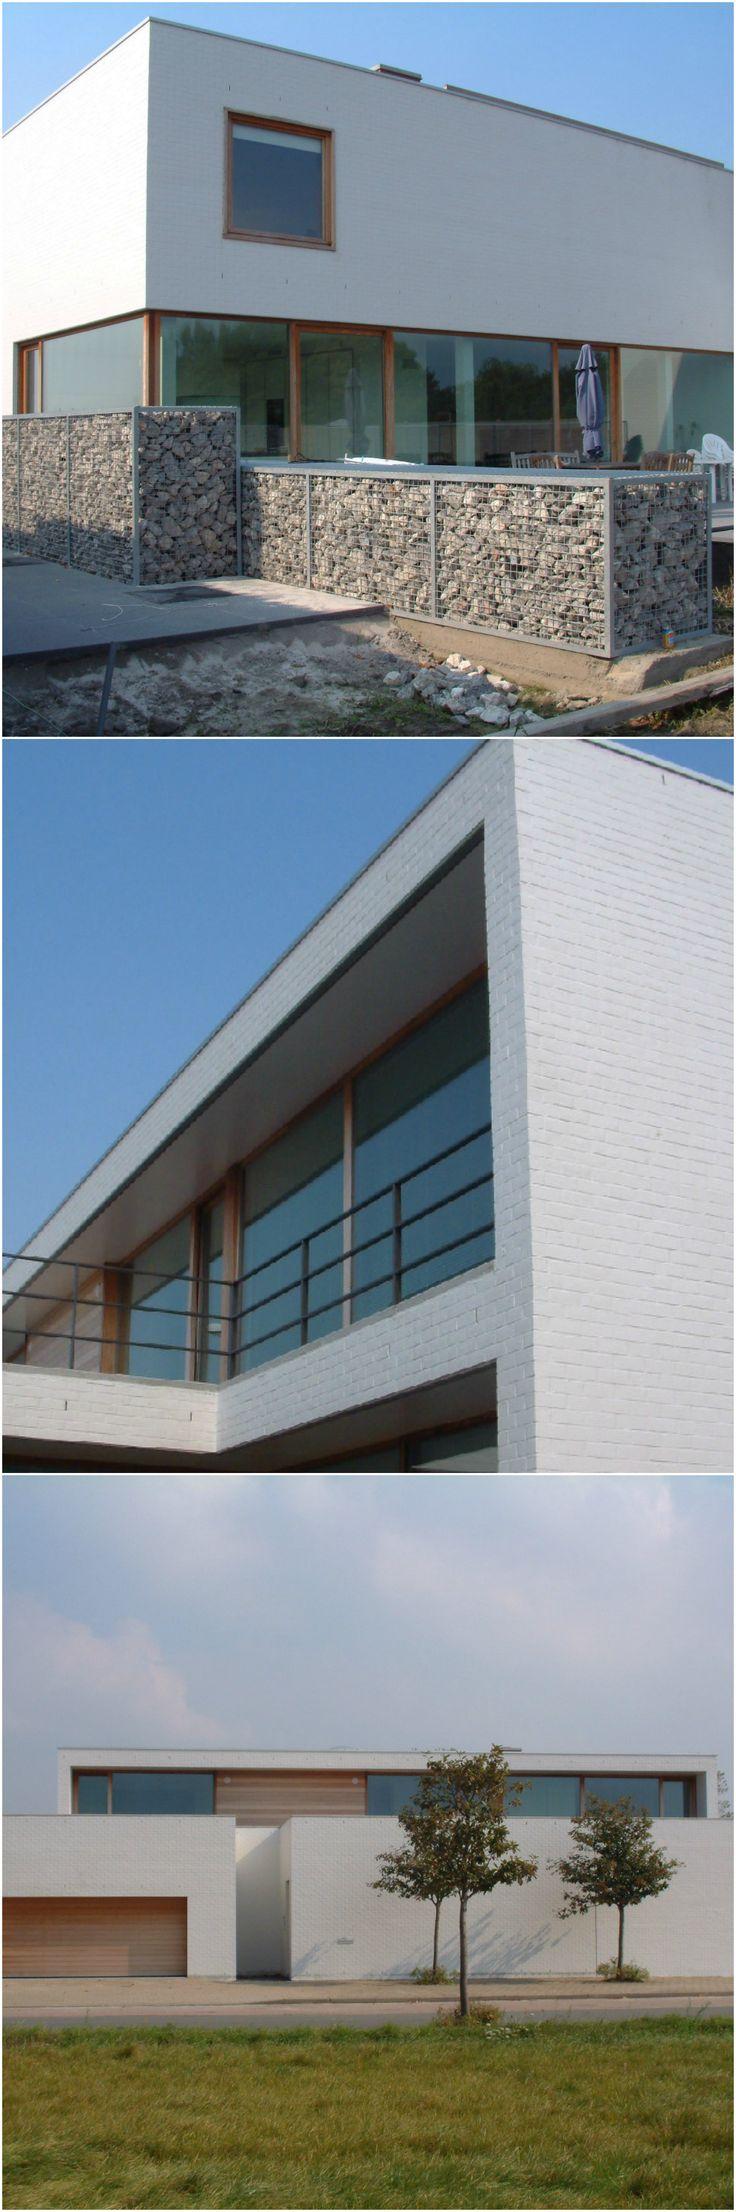 Een witte, moderne villa tussen de rijwoningen • Logica Architectuur (nieuwbouw • modern • witte baksteen • plat dak • houten raamprofielen)